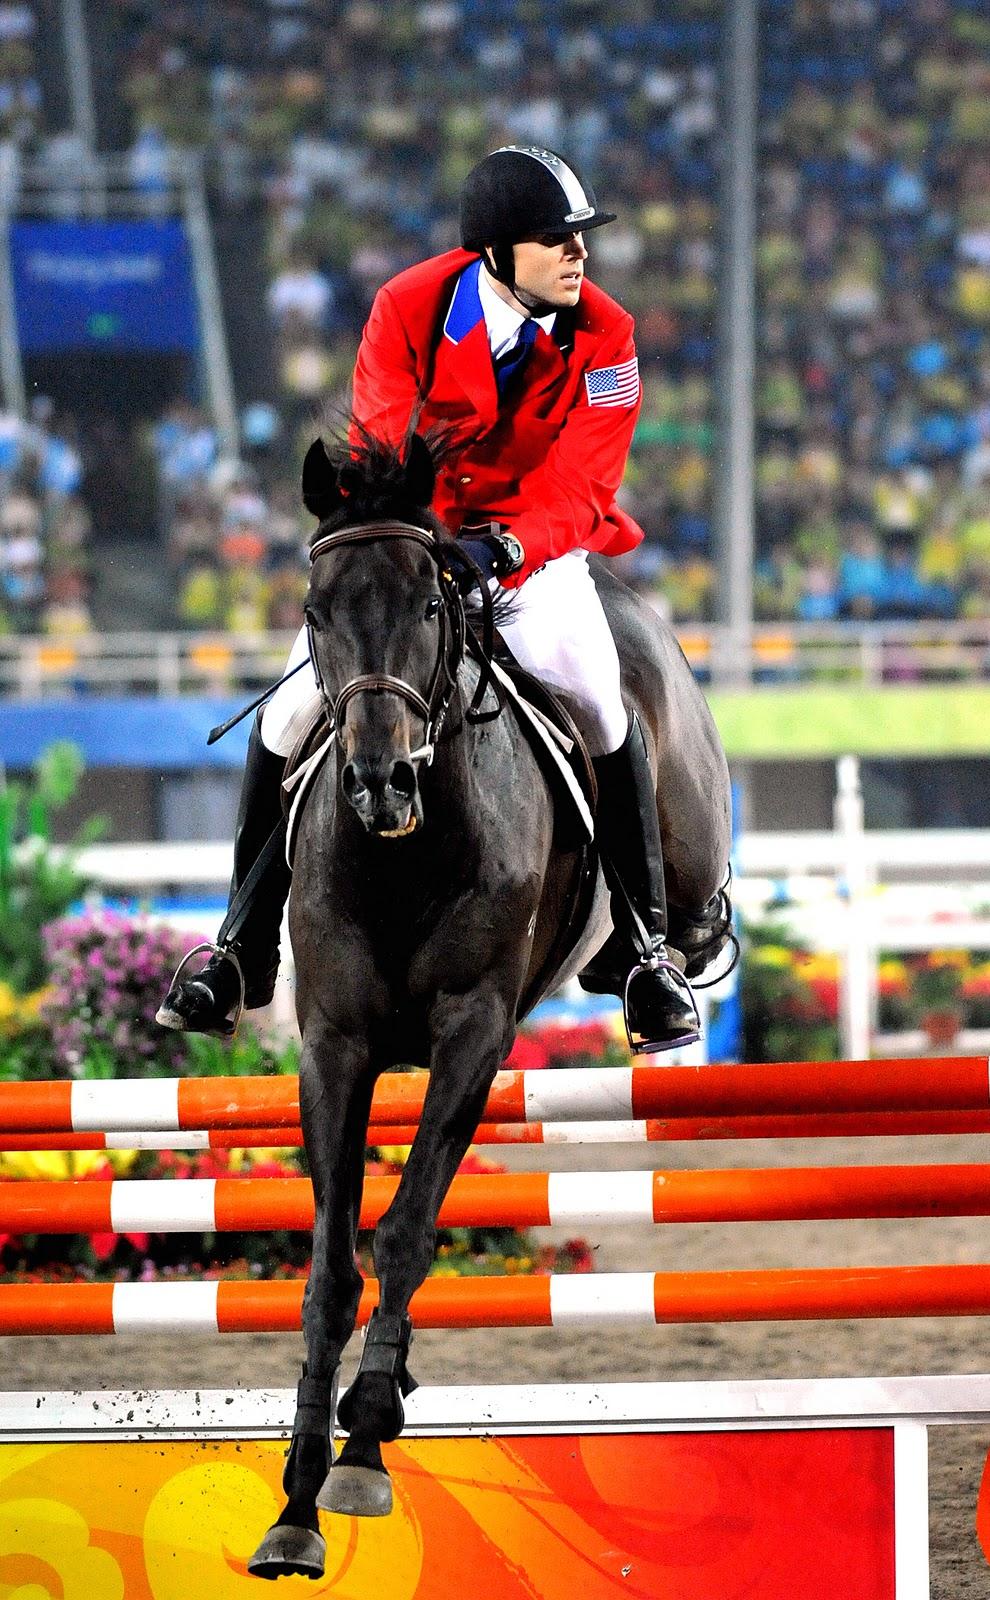 Black horses jumping - photo#17